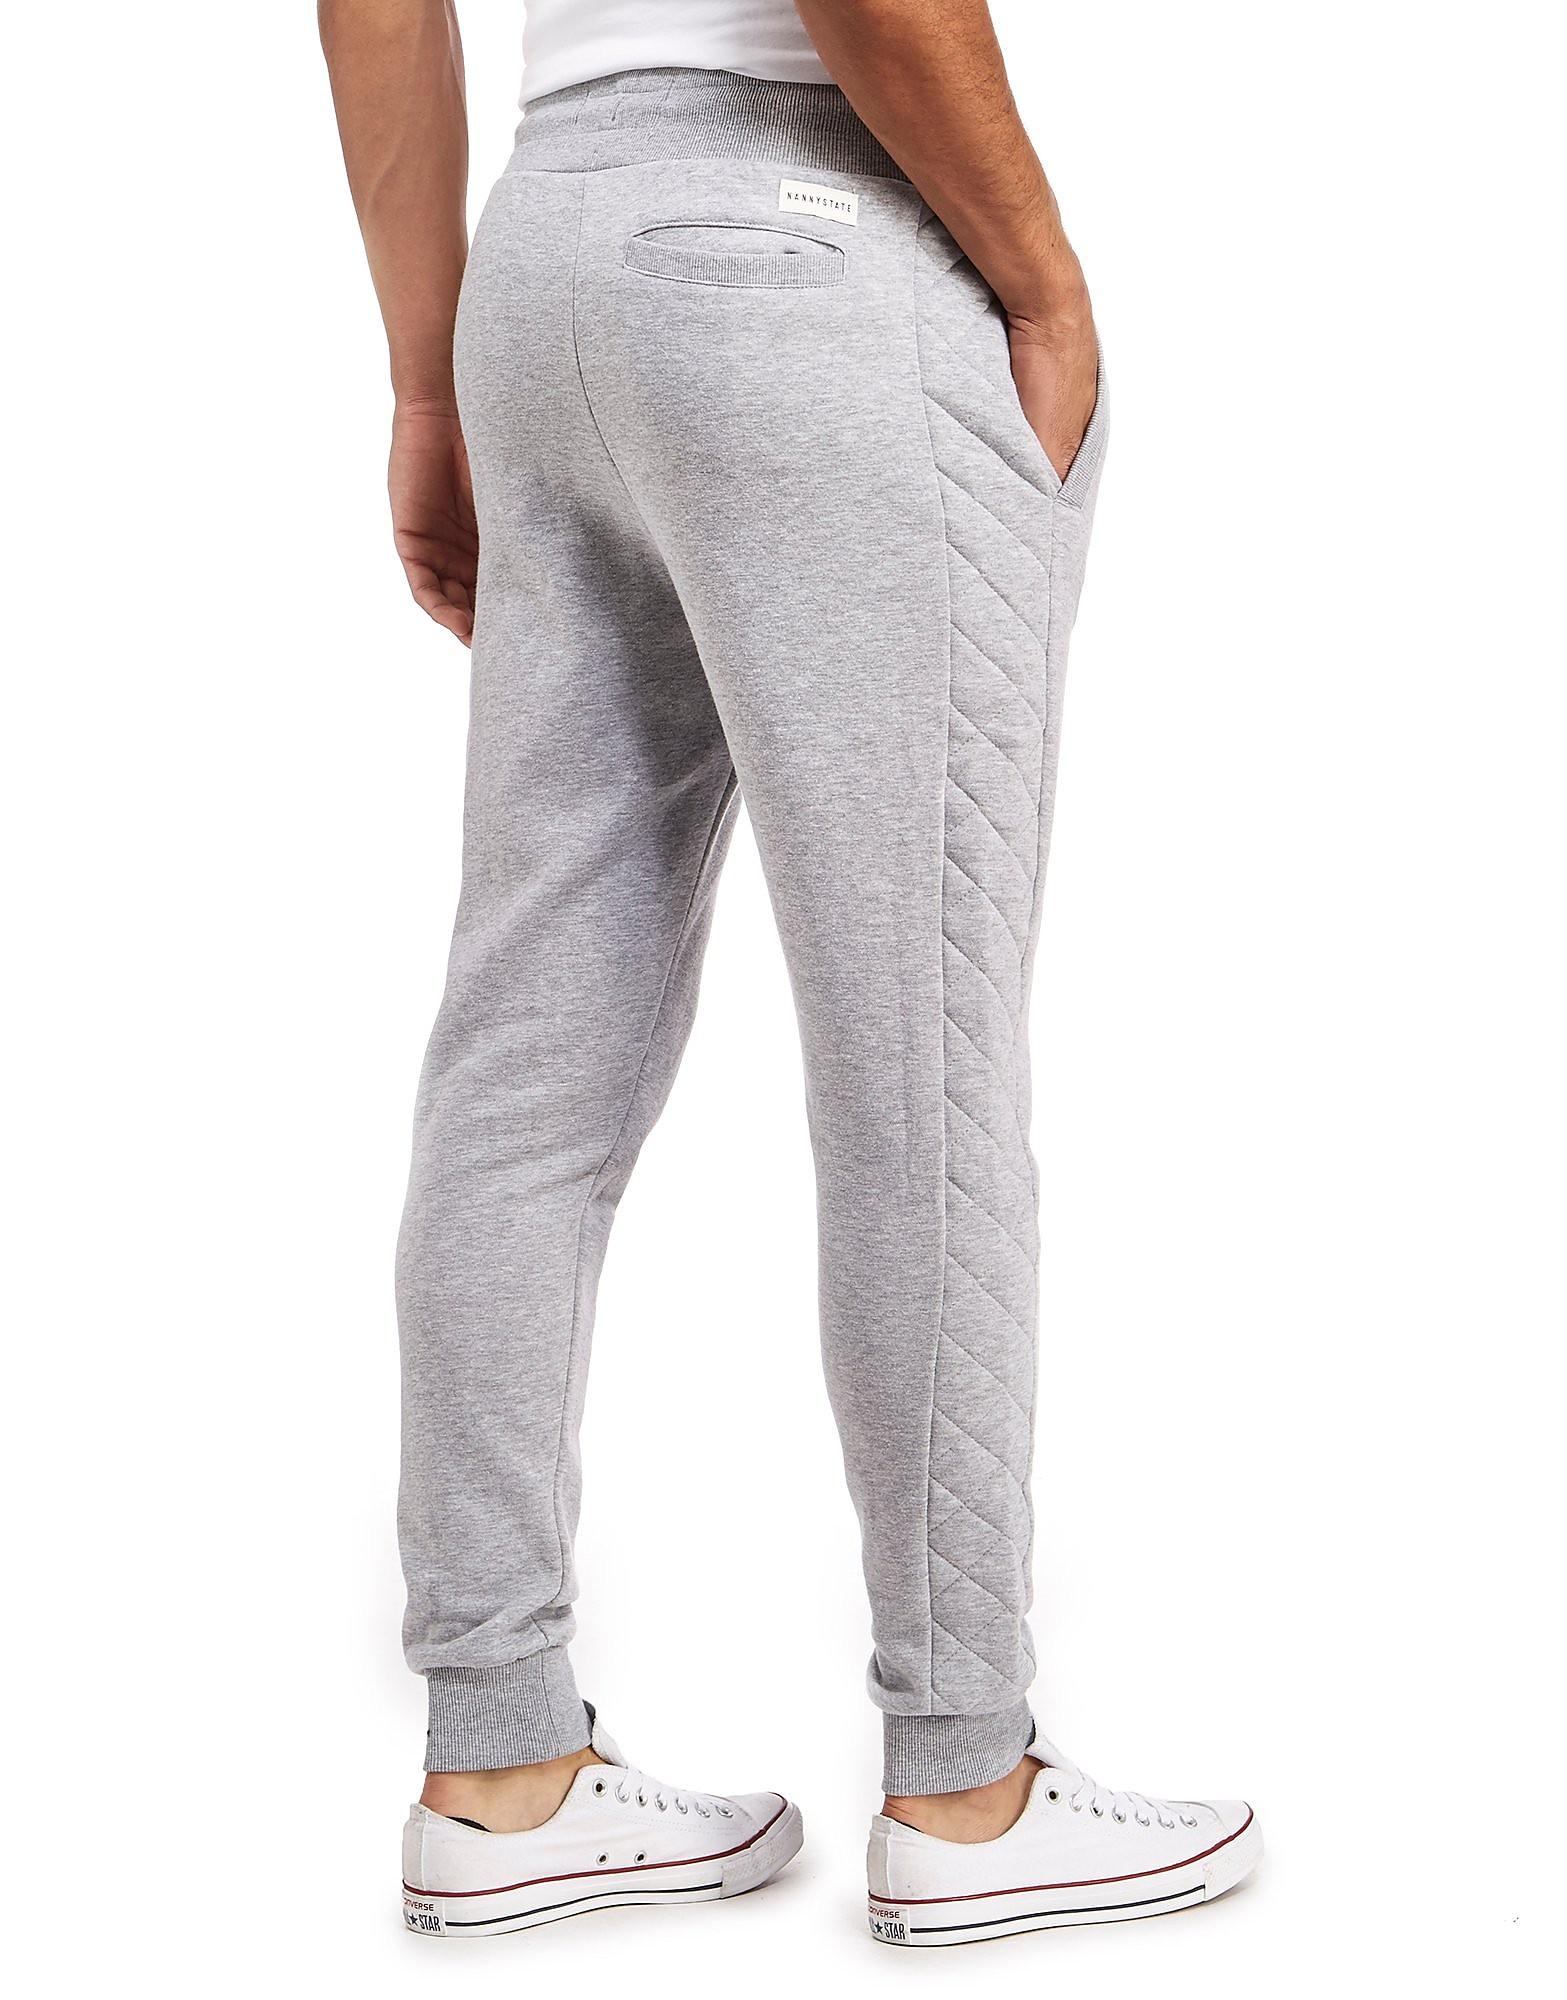 Nanny State Dentom Slim Pants